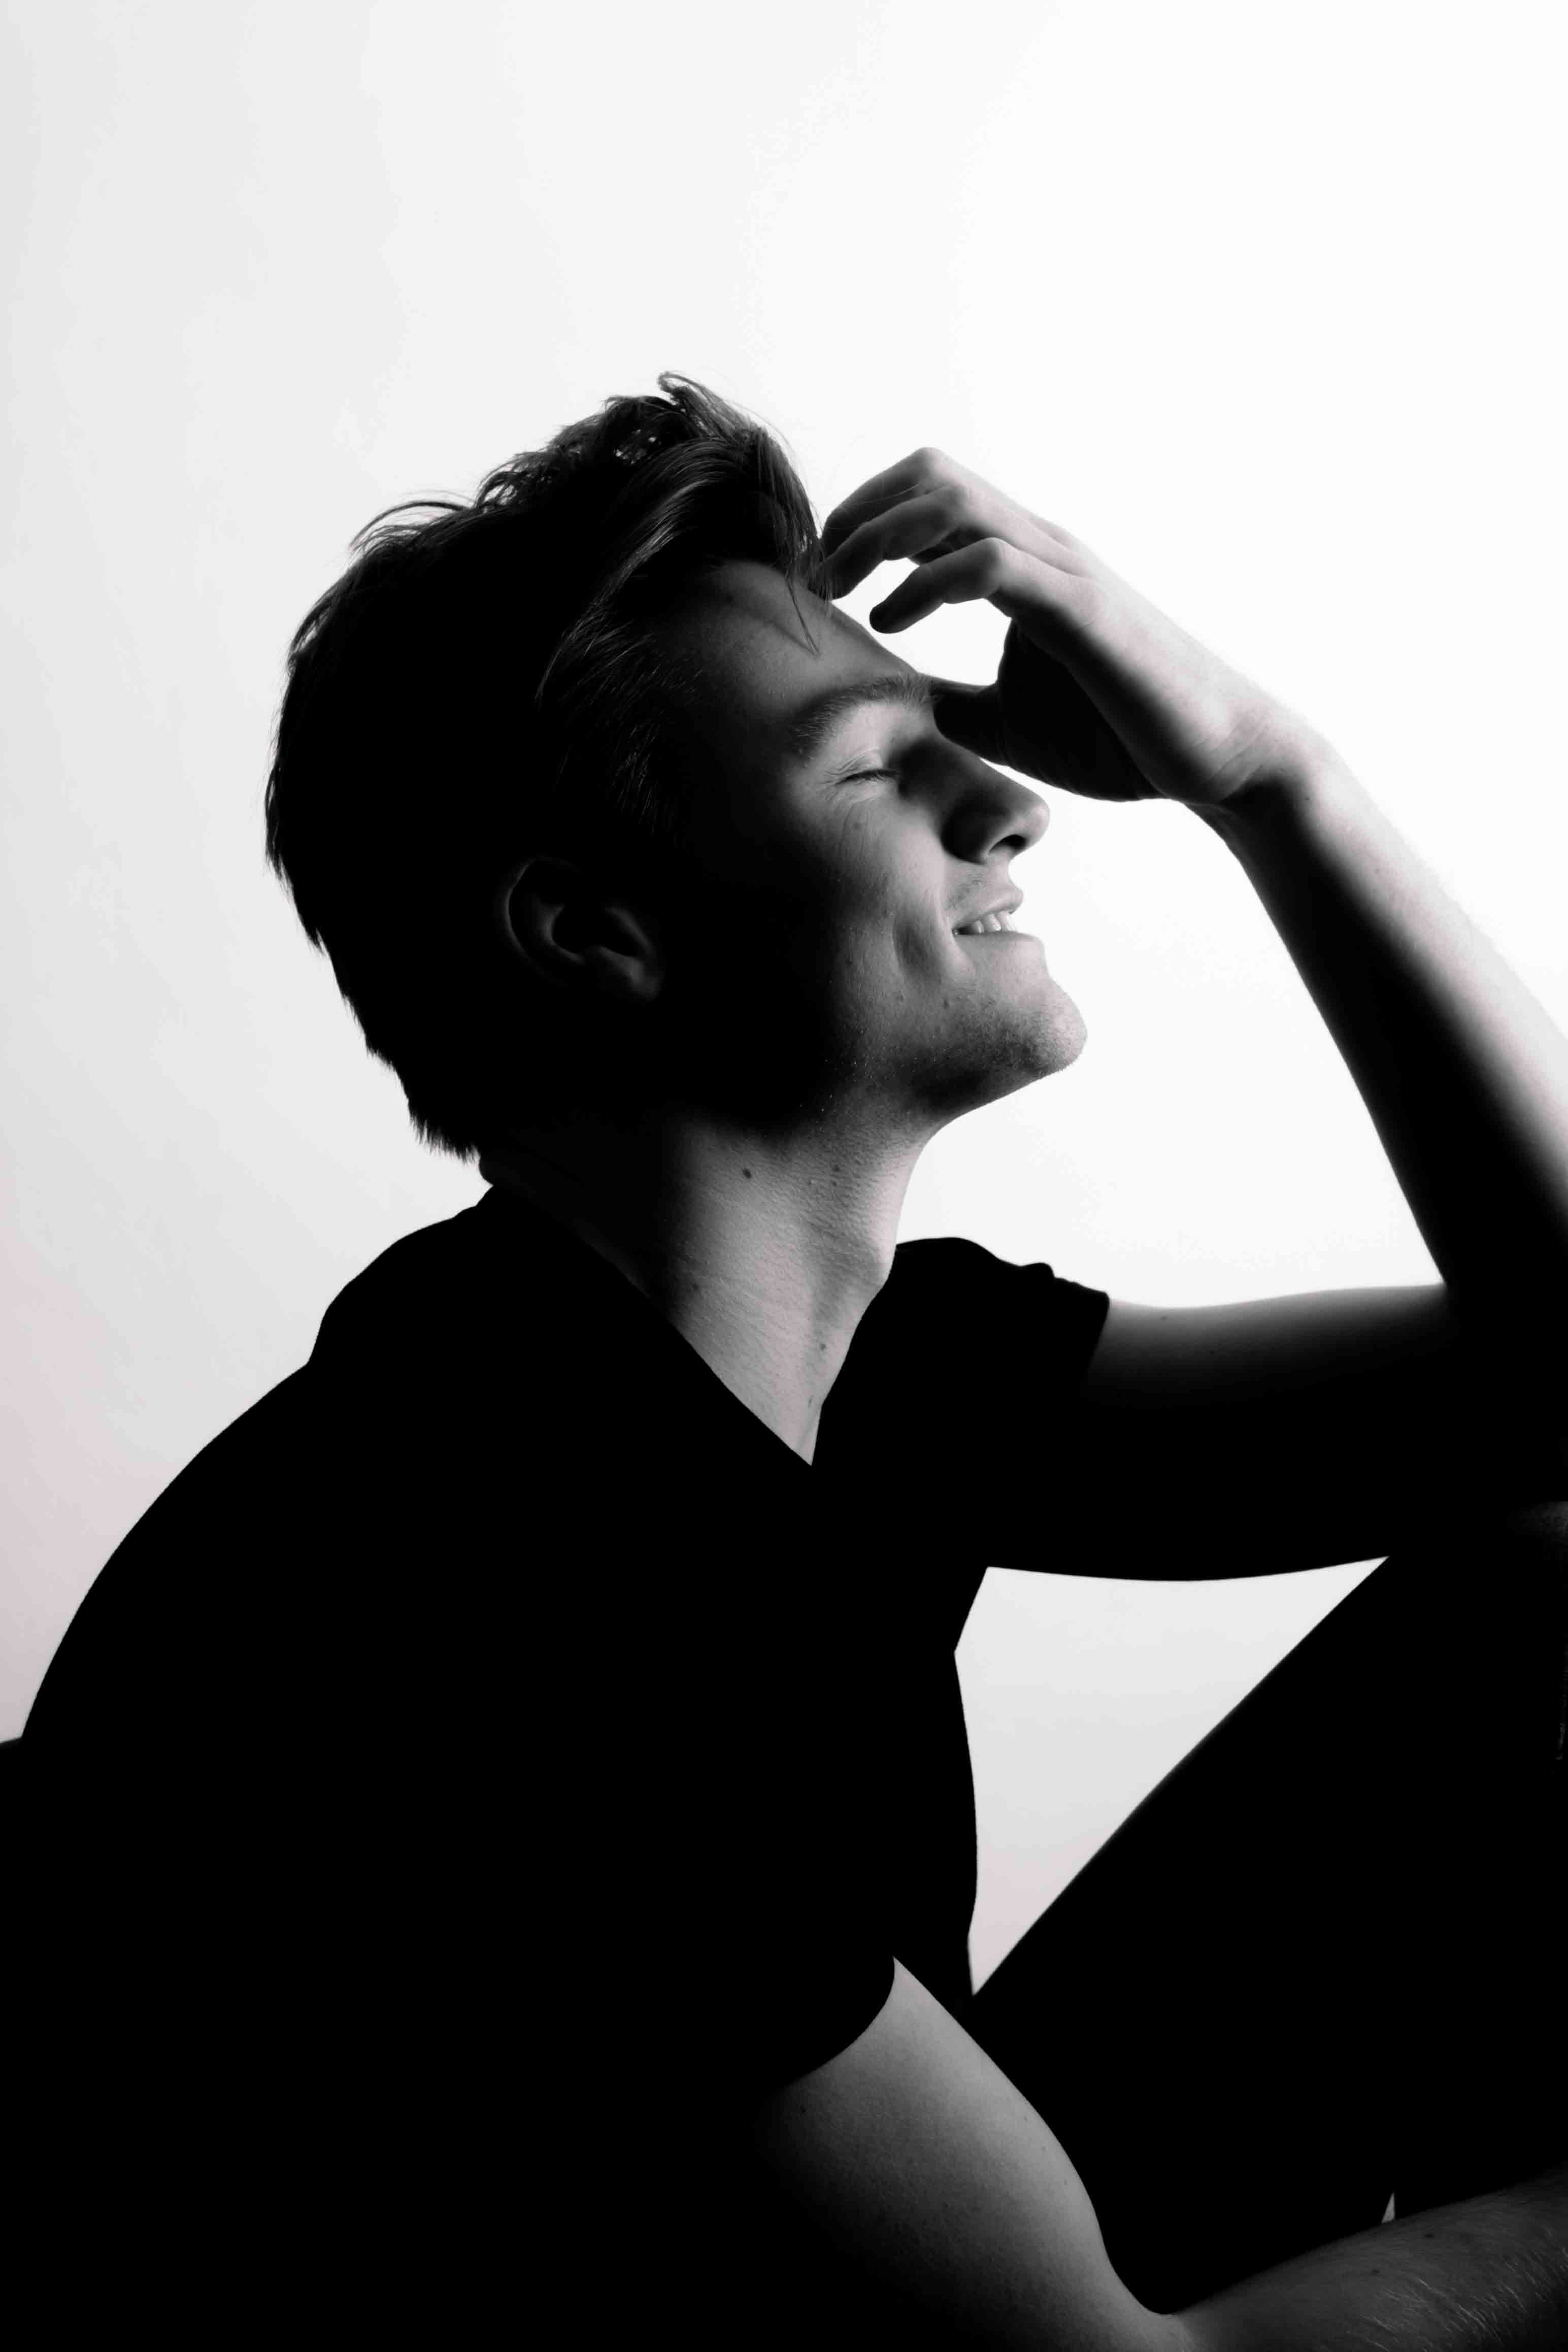 LWP | Fotoshoot Portret | Assen - Studio - Man 8